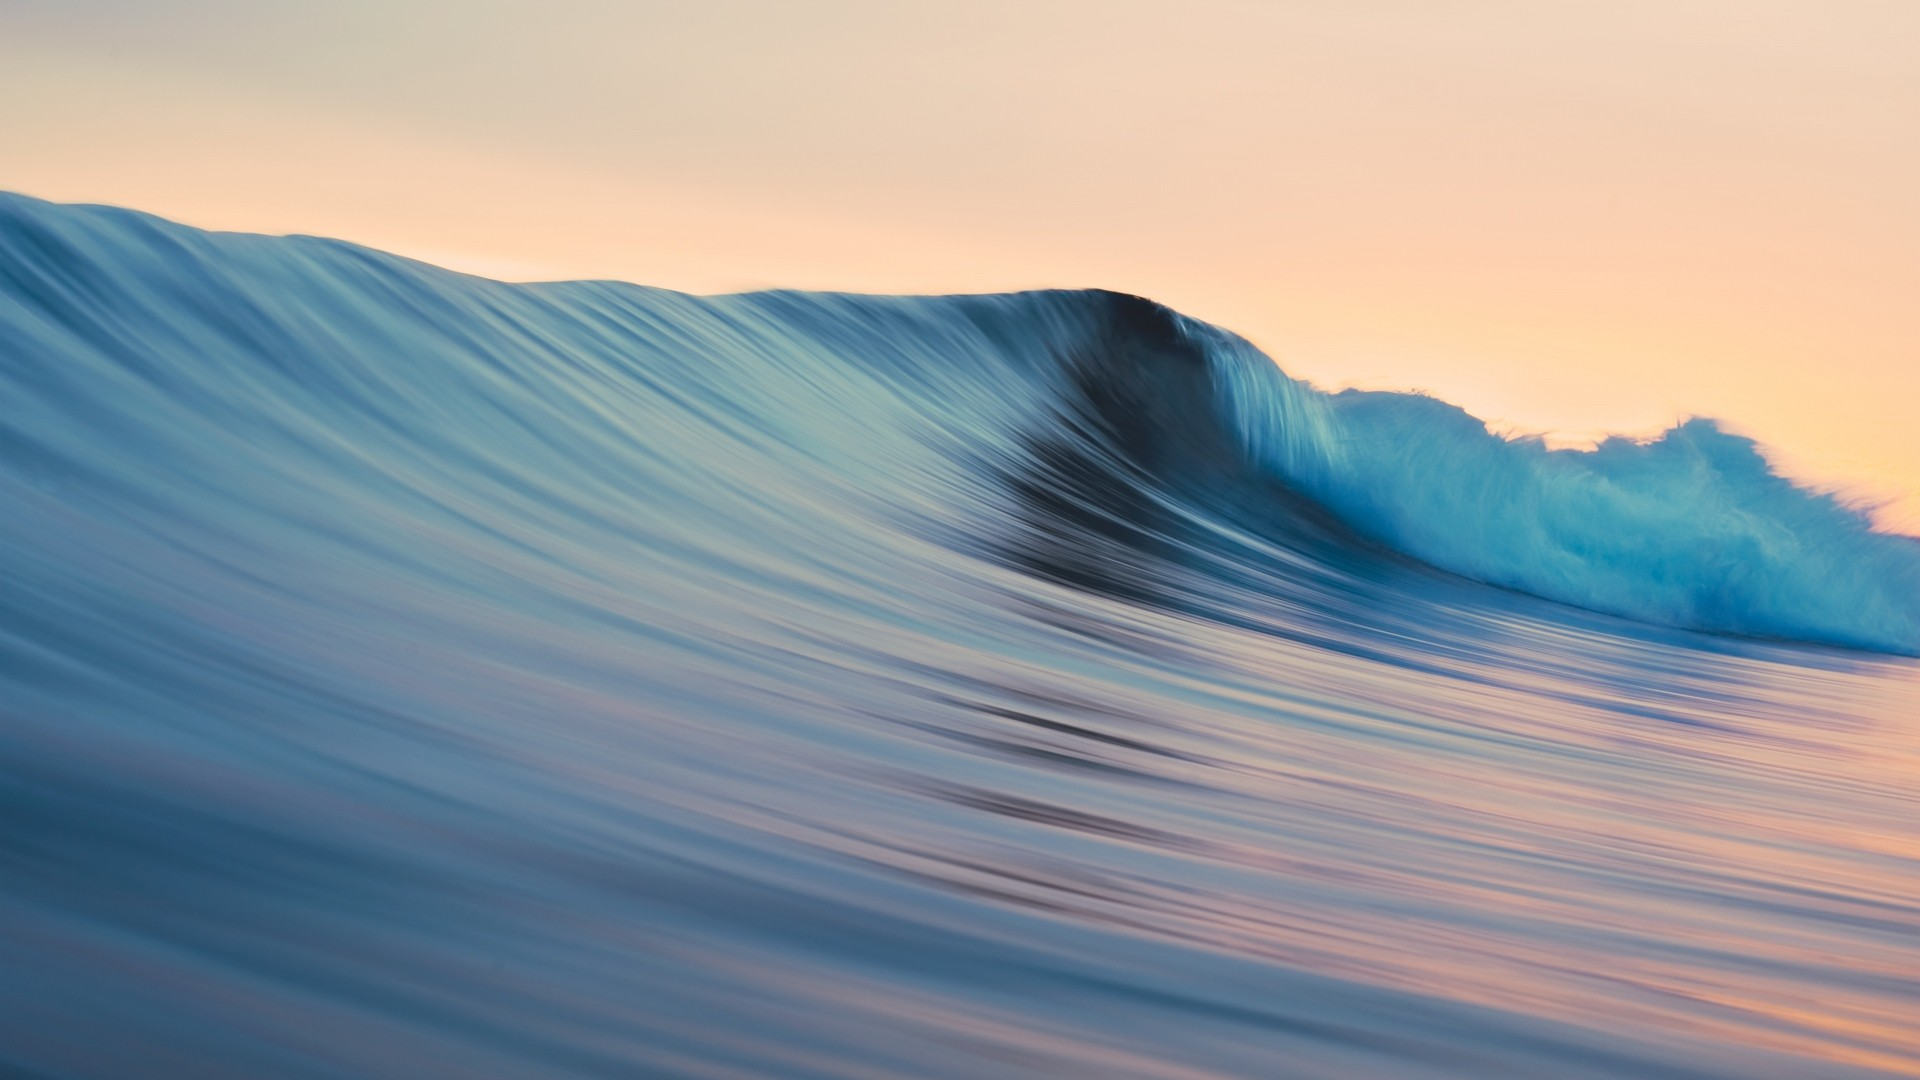 Preview wallpaper mac, os x, apple, mavericks, waves, wave 1920×1080